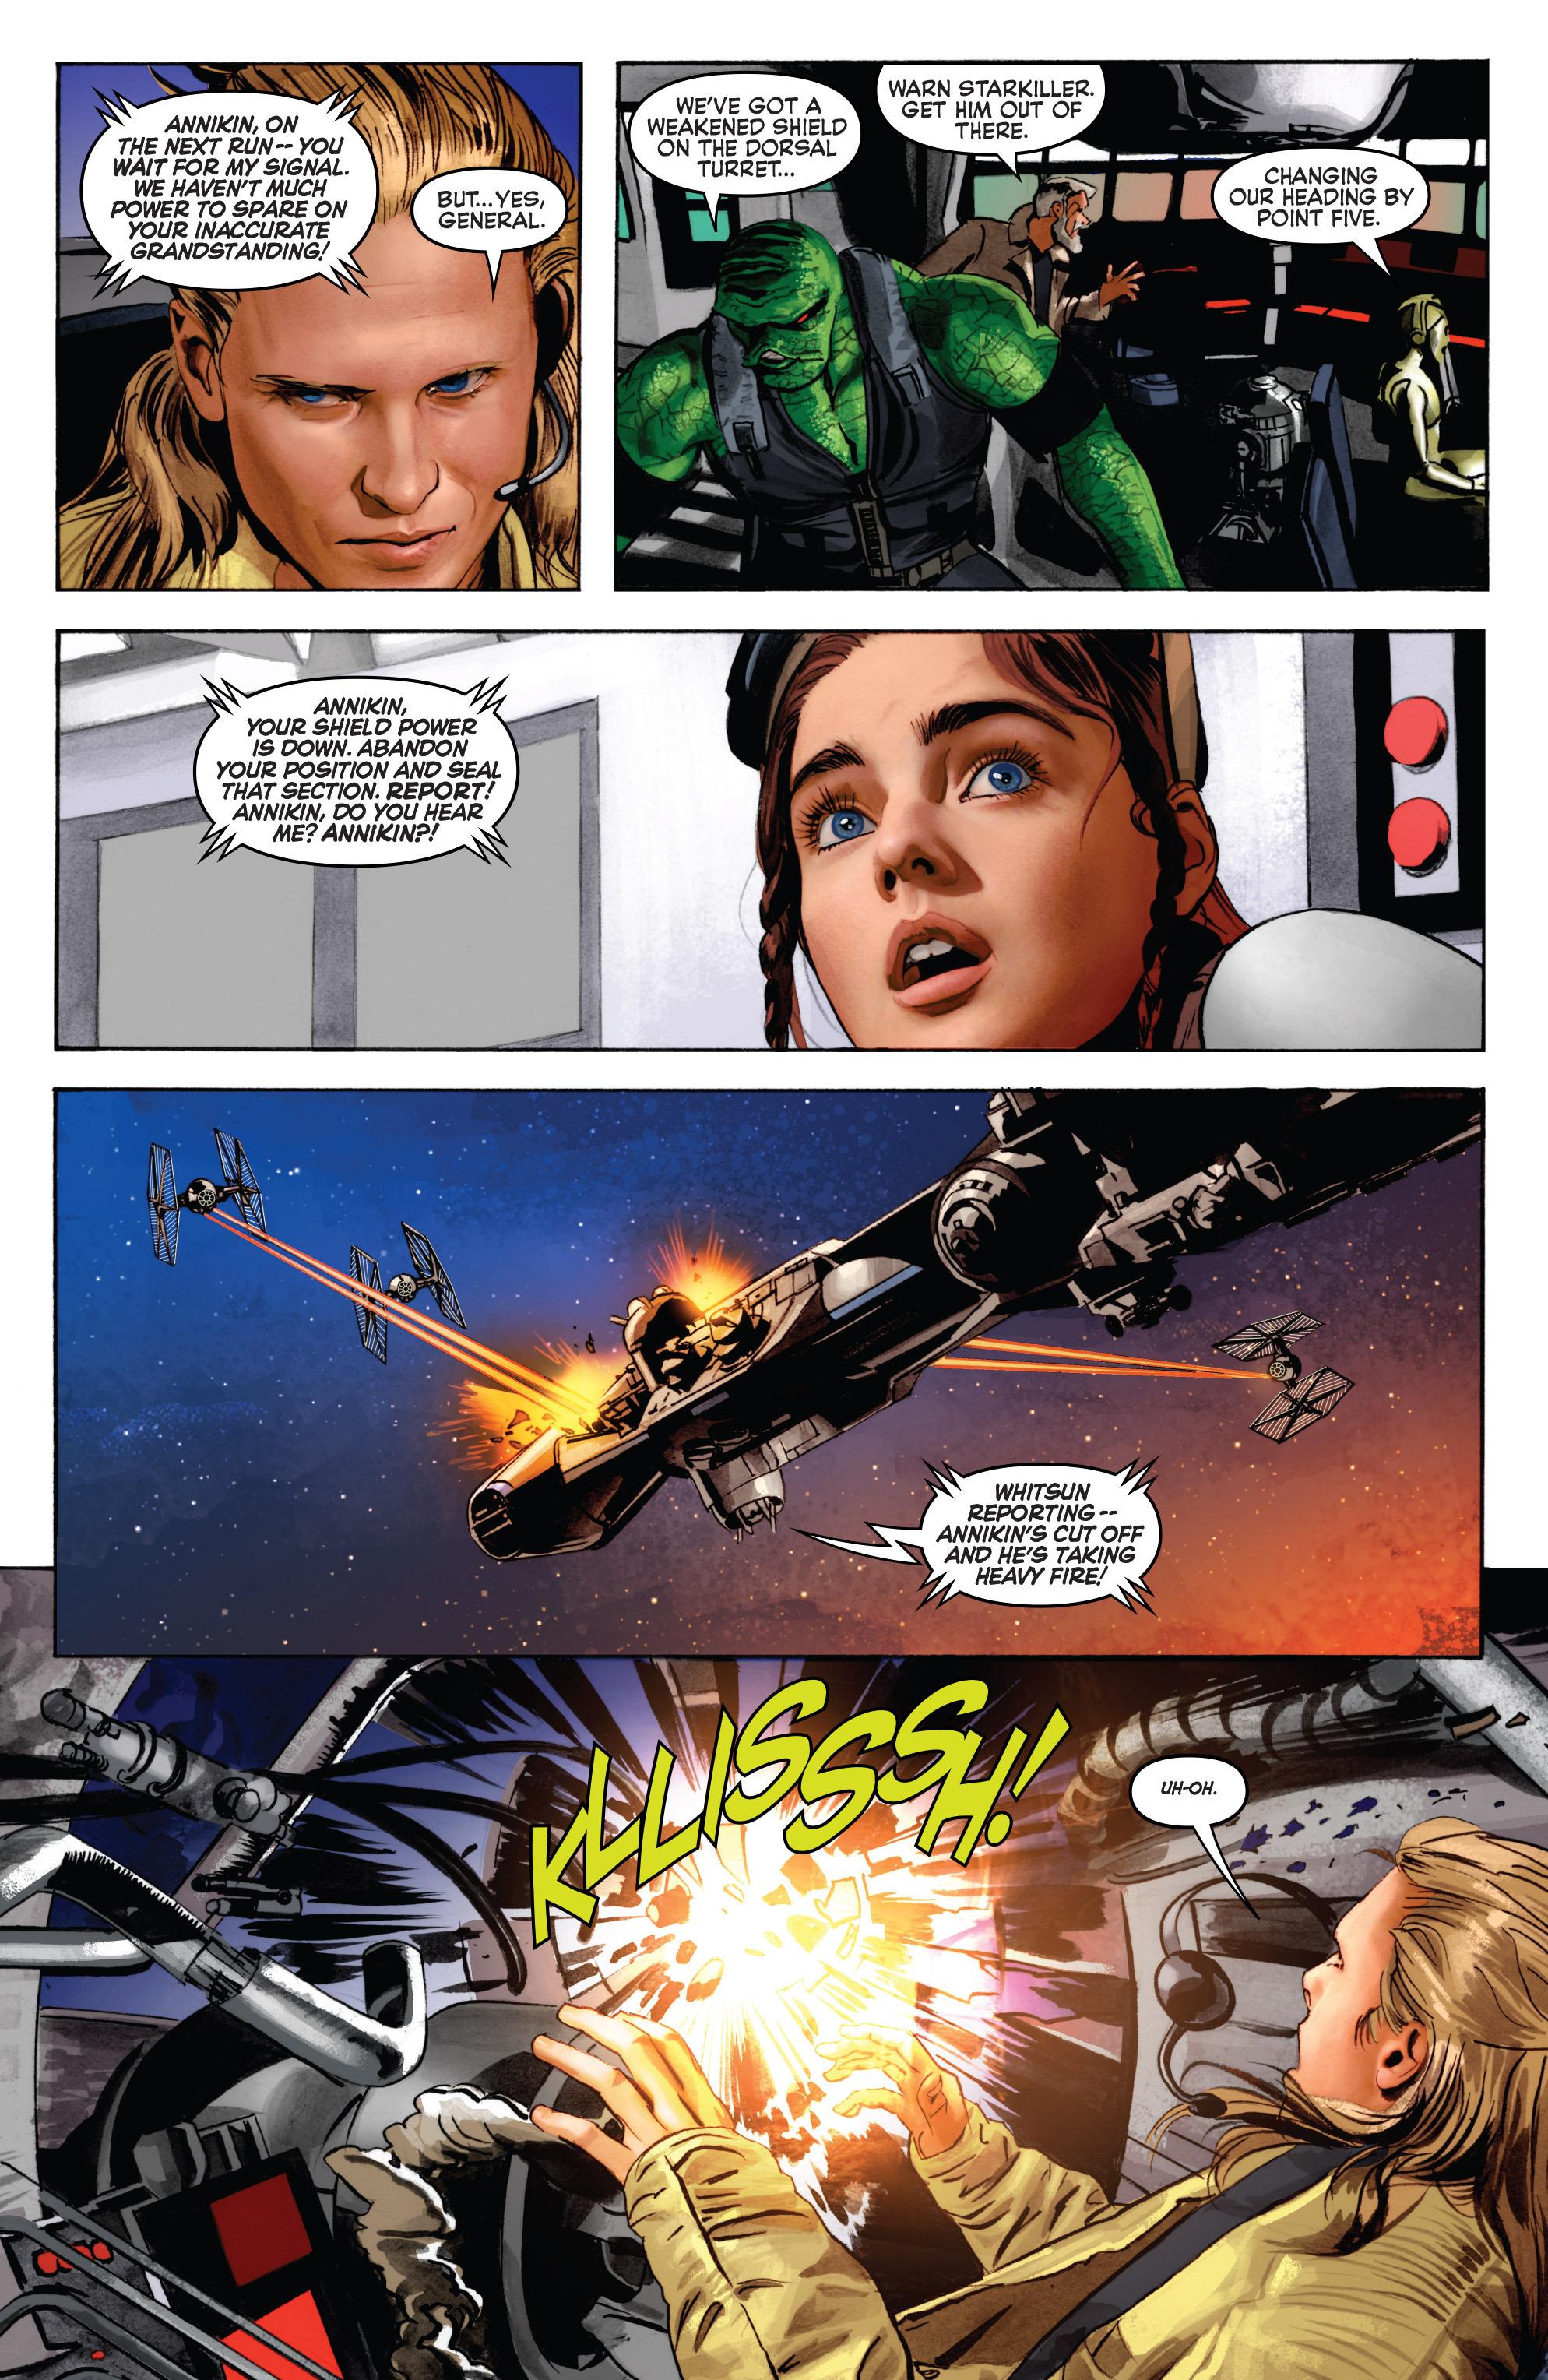 THE STAR WARS comic (2015, Marvel edition) Vol.7 4